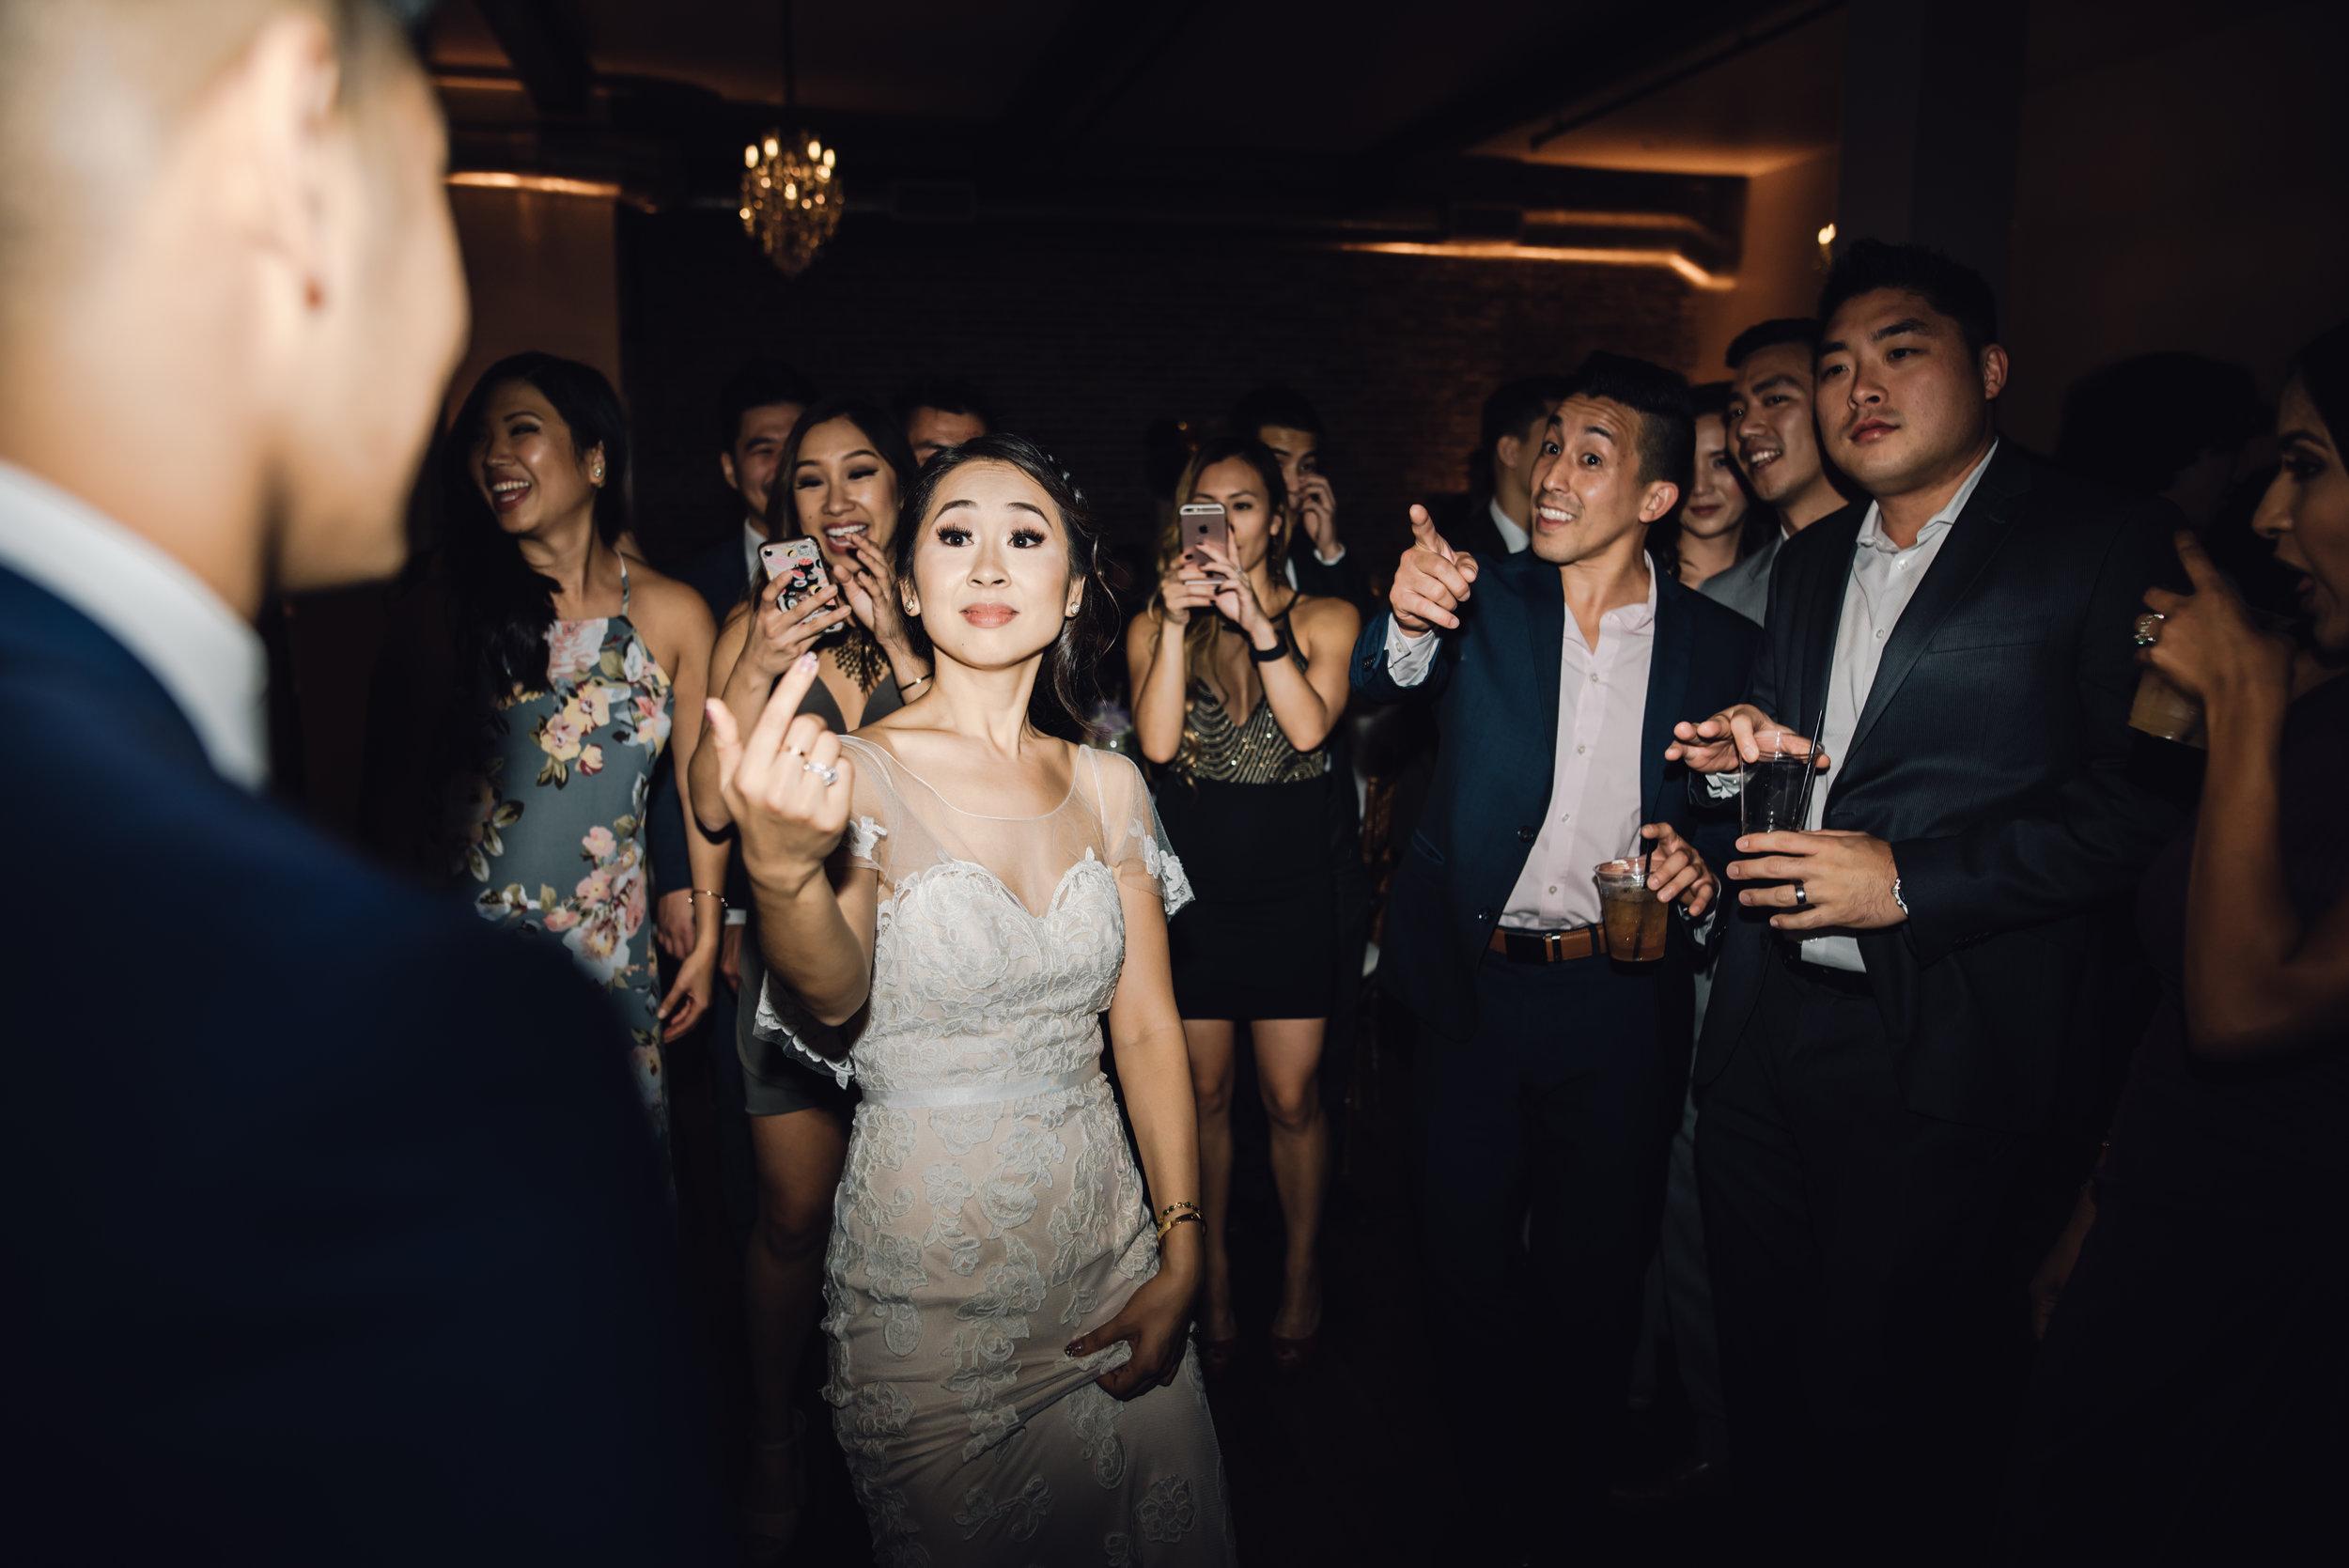 Main and Simple Photography_2017_Weddings_SanJuanCapistrano_J+B-2116.jpg